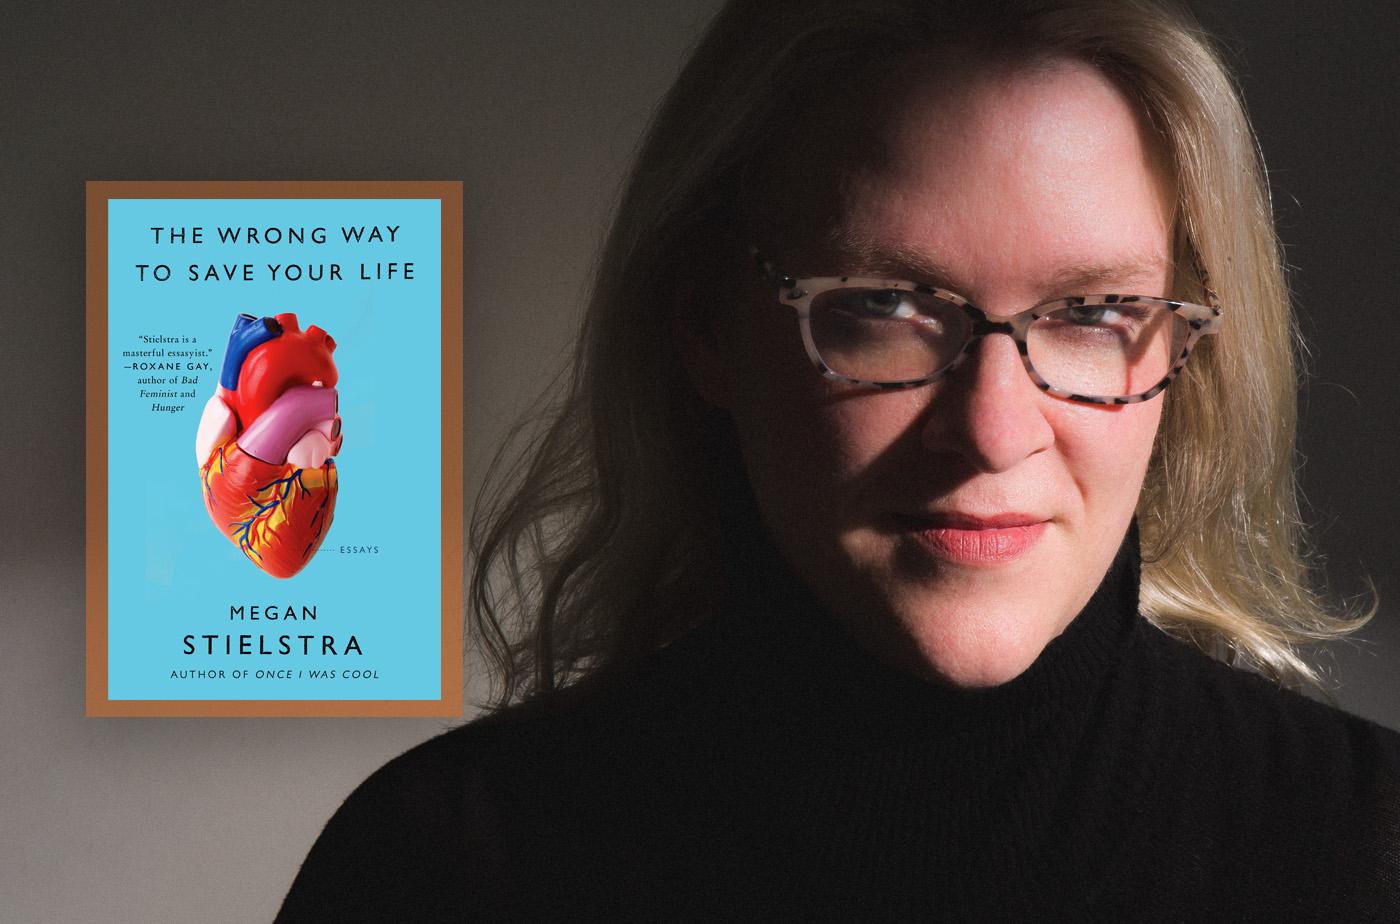 Catapult online classes: Megan Stielstra, The Online Memoir Generator: 12 Months to a Full Draft, Nonfiction, Memoir, Workshop